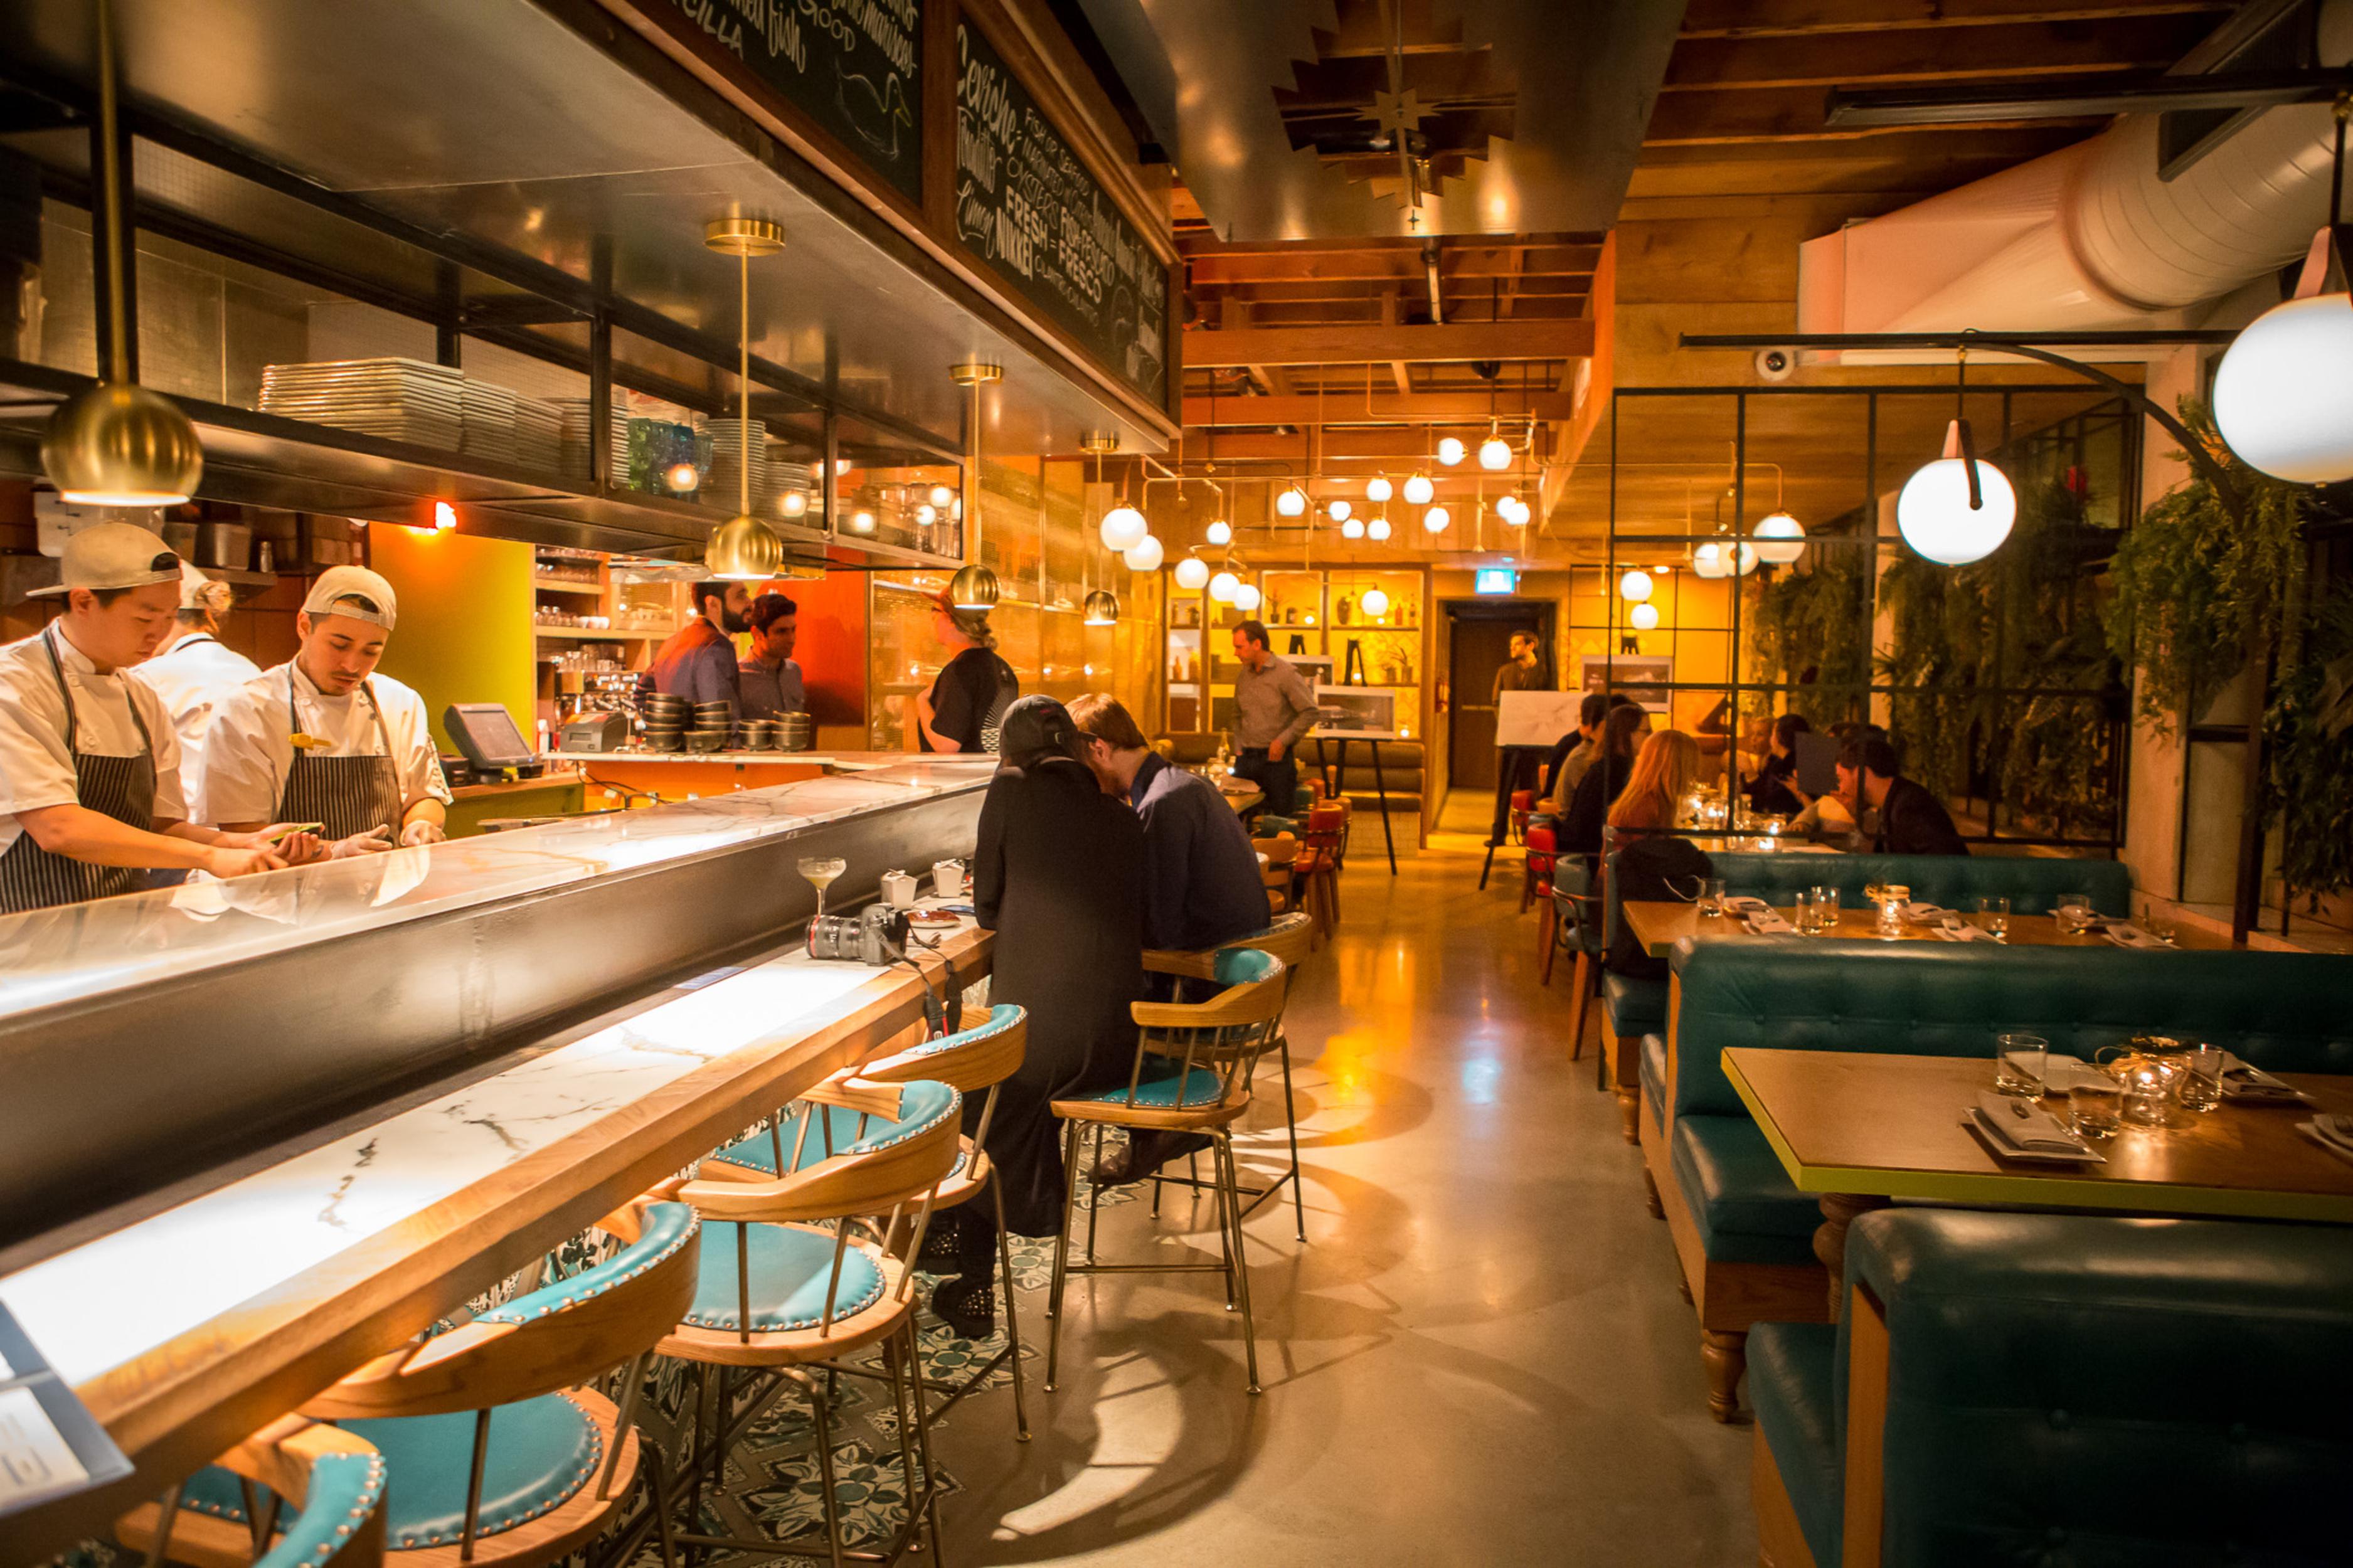 10 New Restaurants With Beautiful Interior Design In Toronto